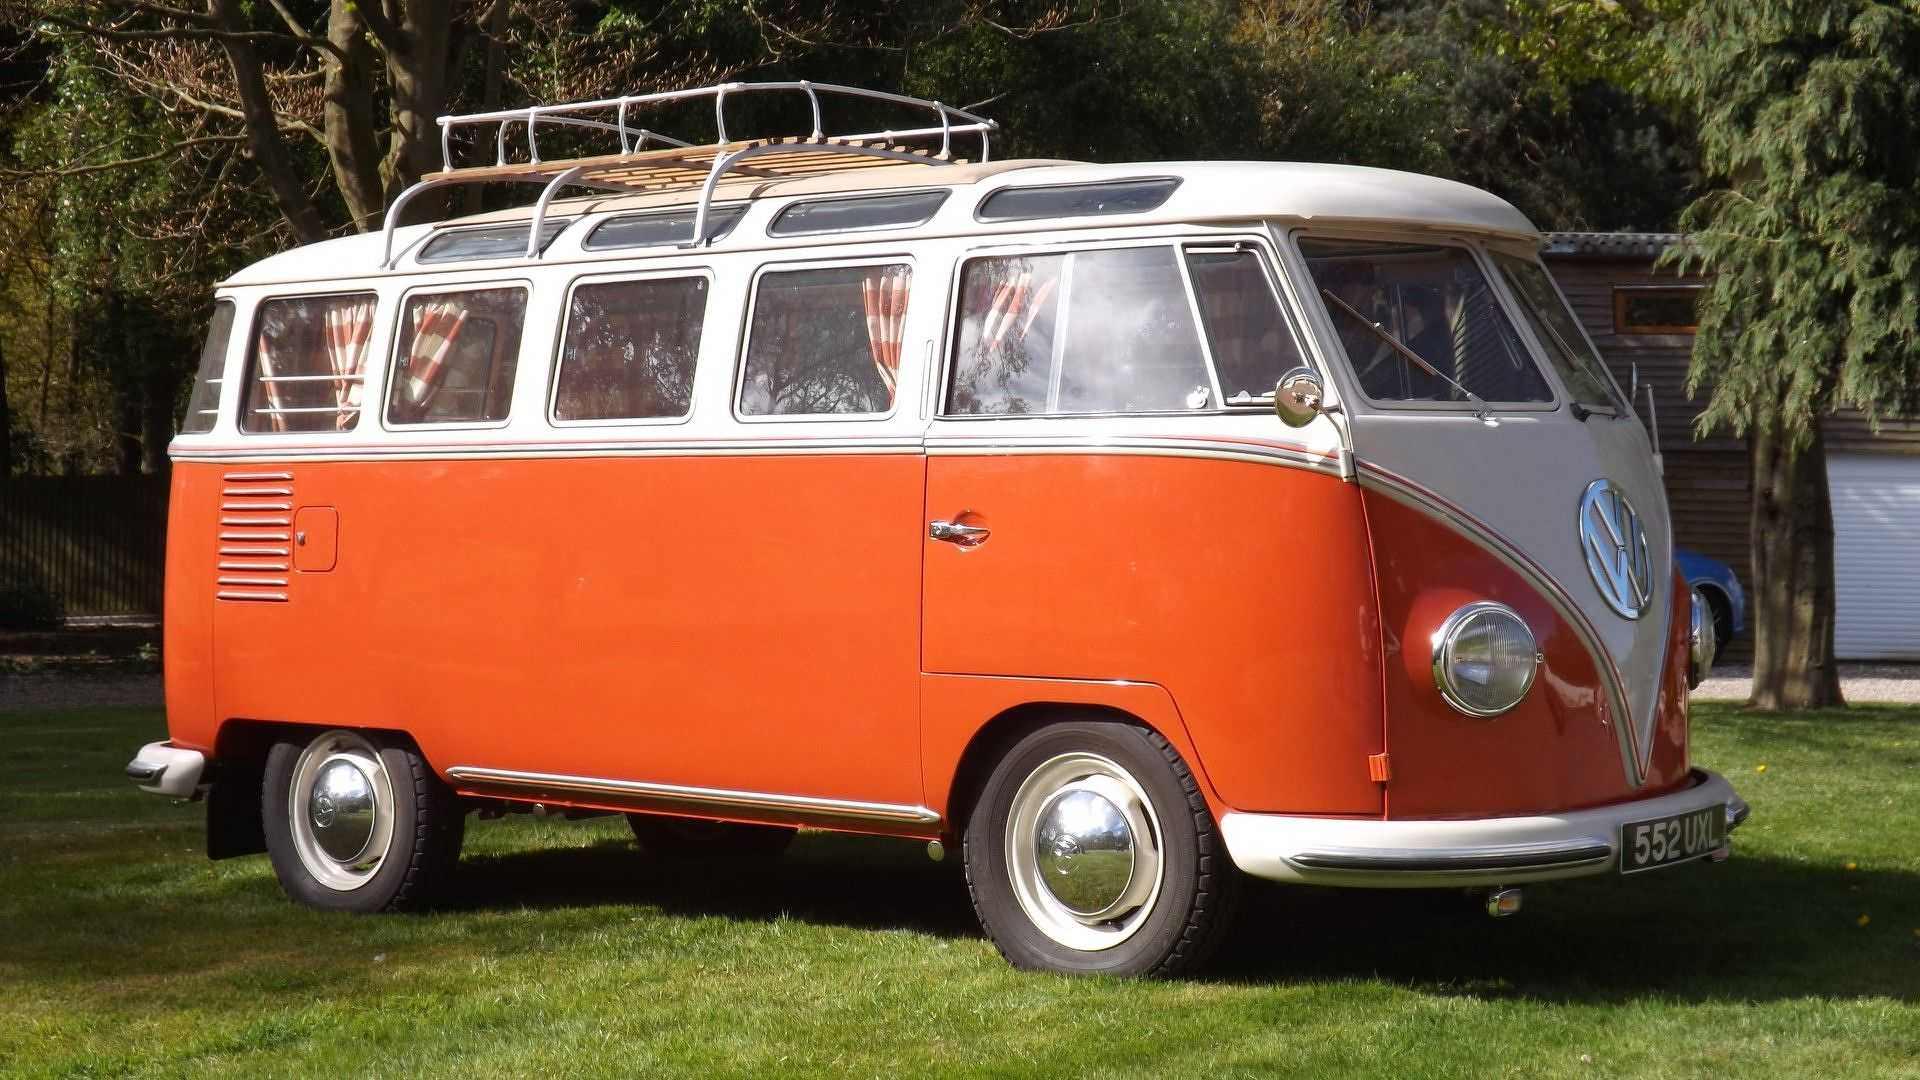 Ретро-кемпер Volkswagen T1 Samba 1959 года выпуска